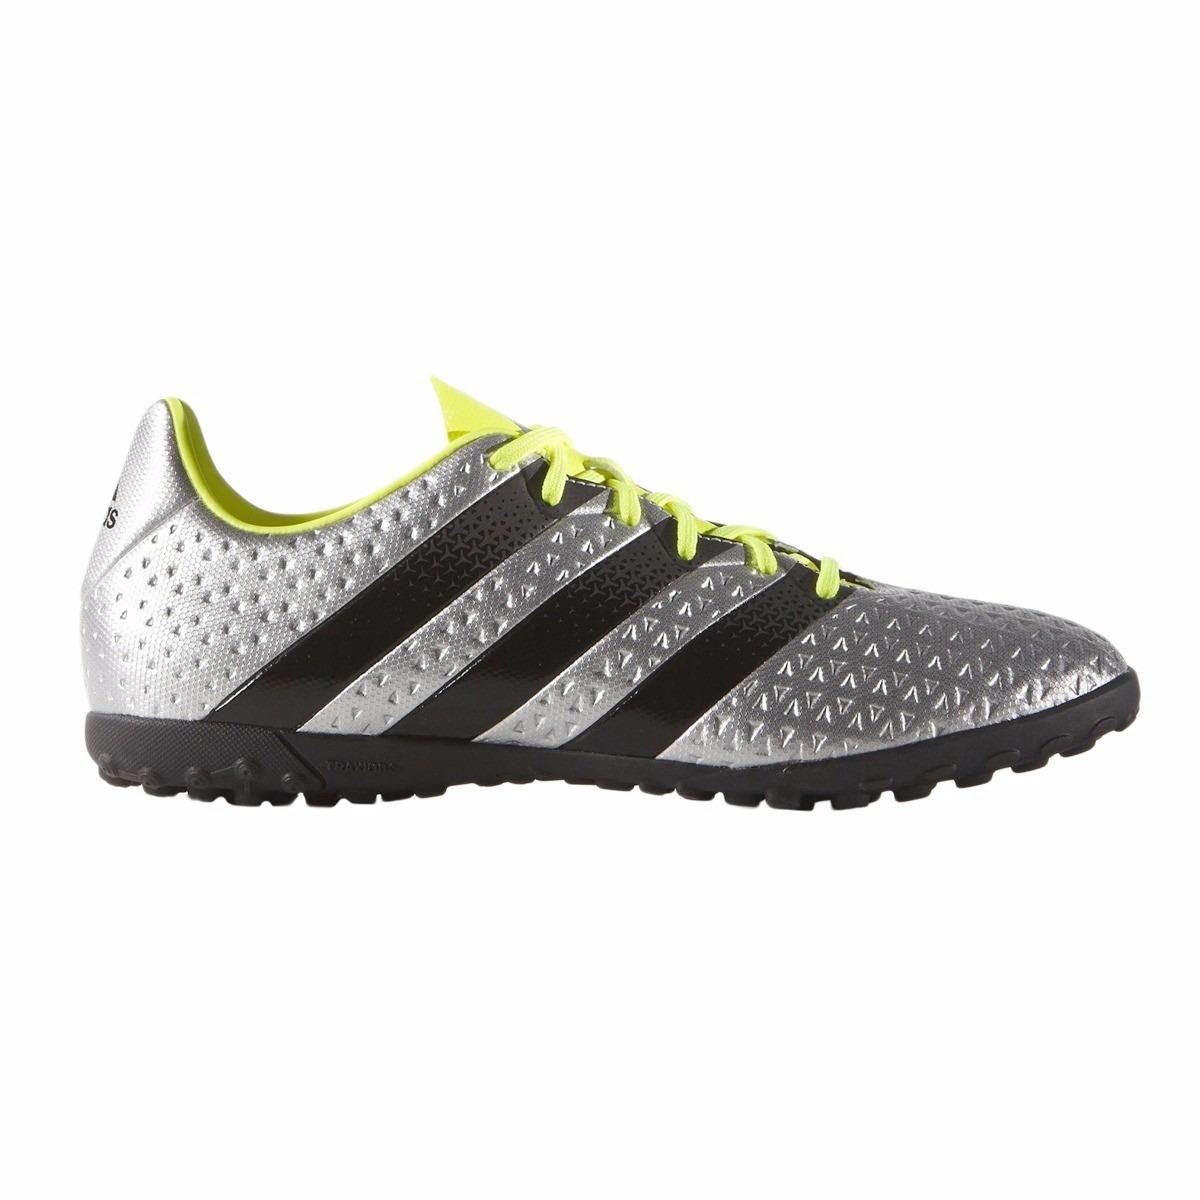 1a78a79d Botines adidas Ace 16.4 Tf Mercury Pack Papi Fútbol Oferta! - $ 999 ...